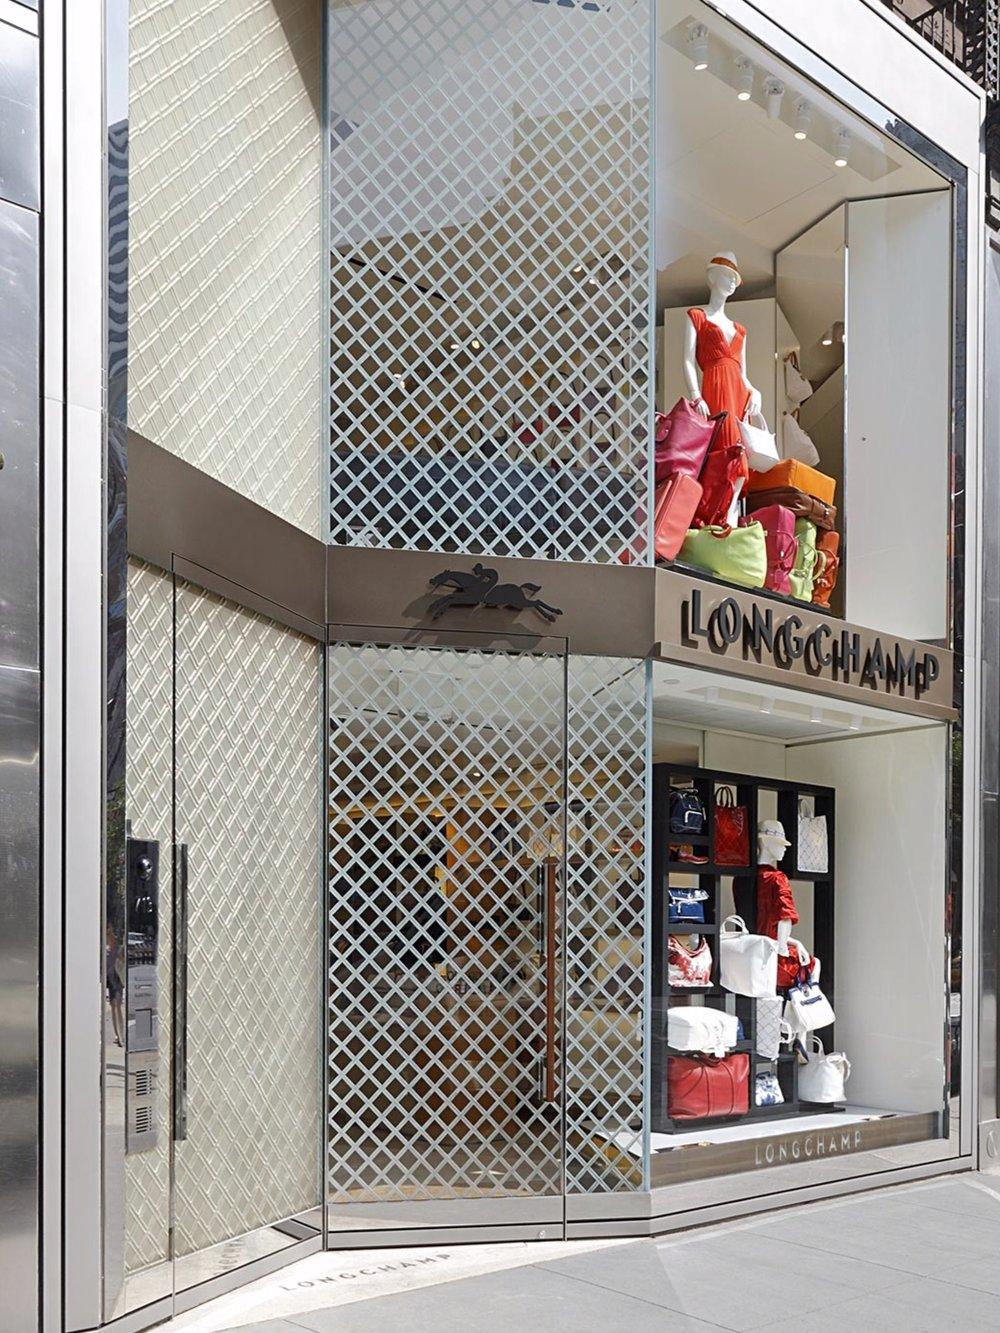 longchamp-newyork-carbondale-04.jpg